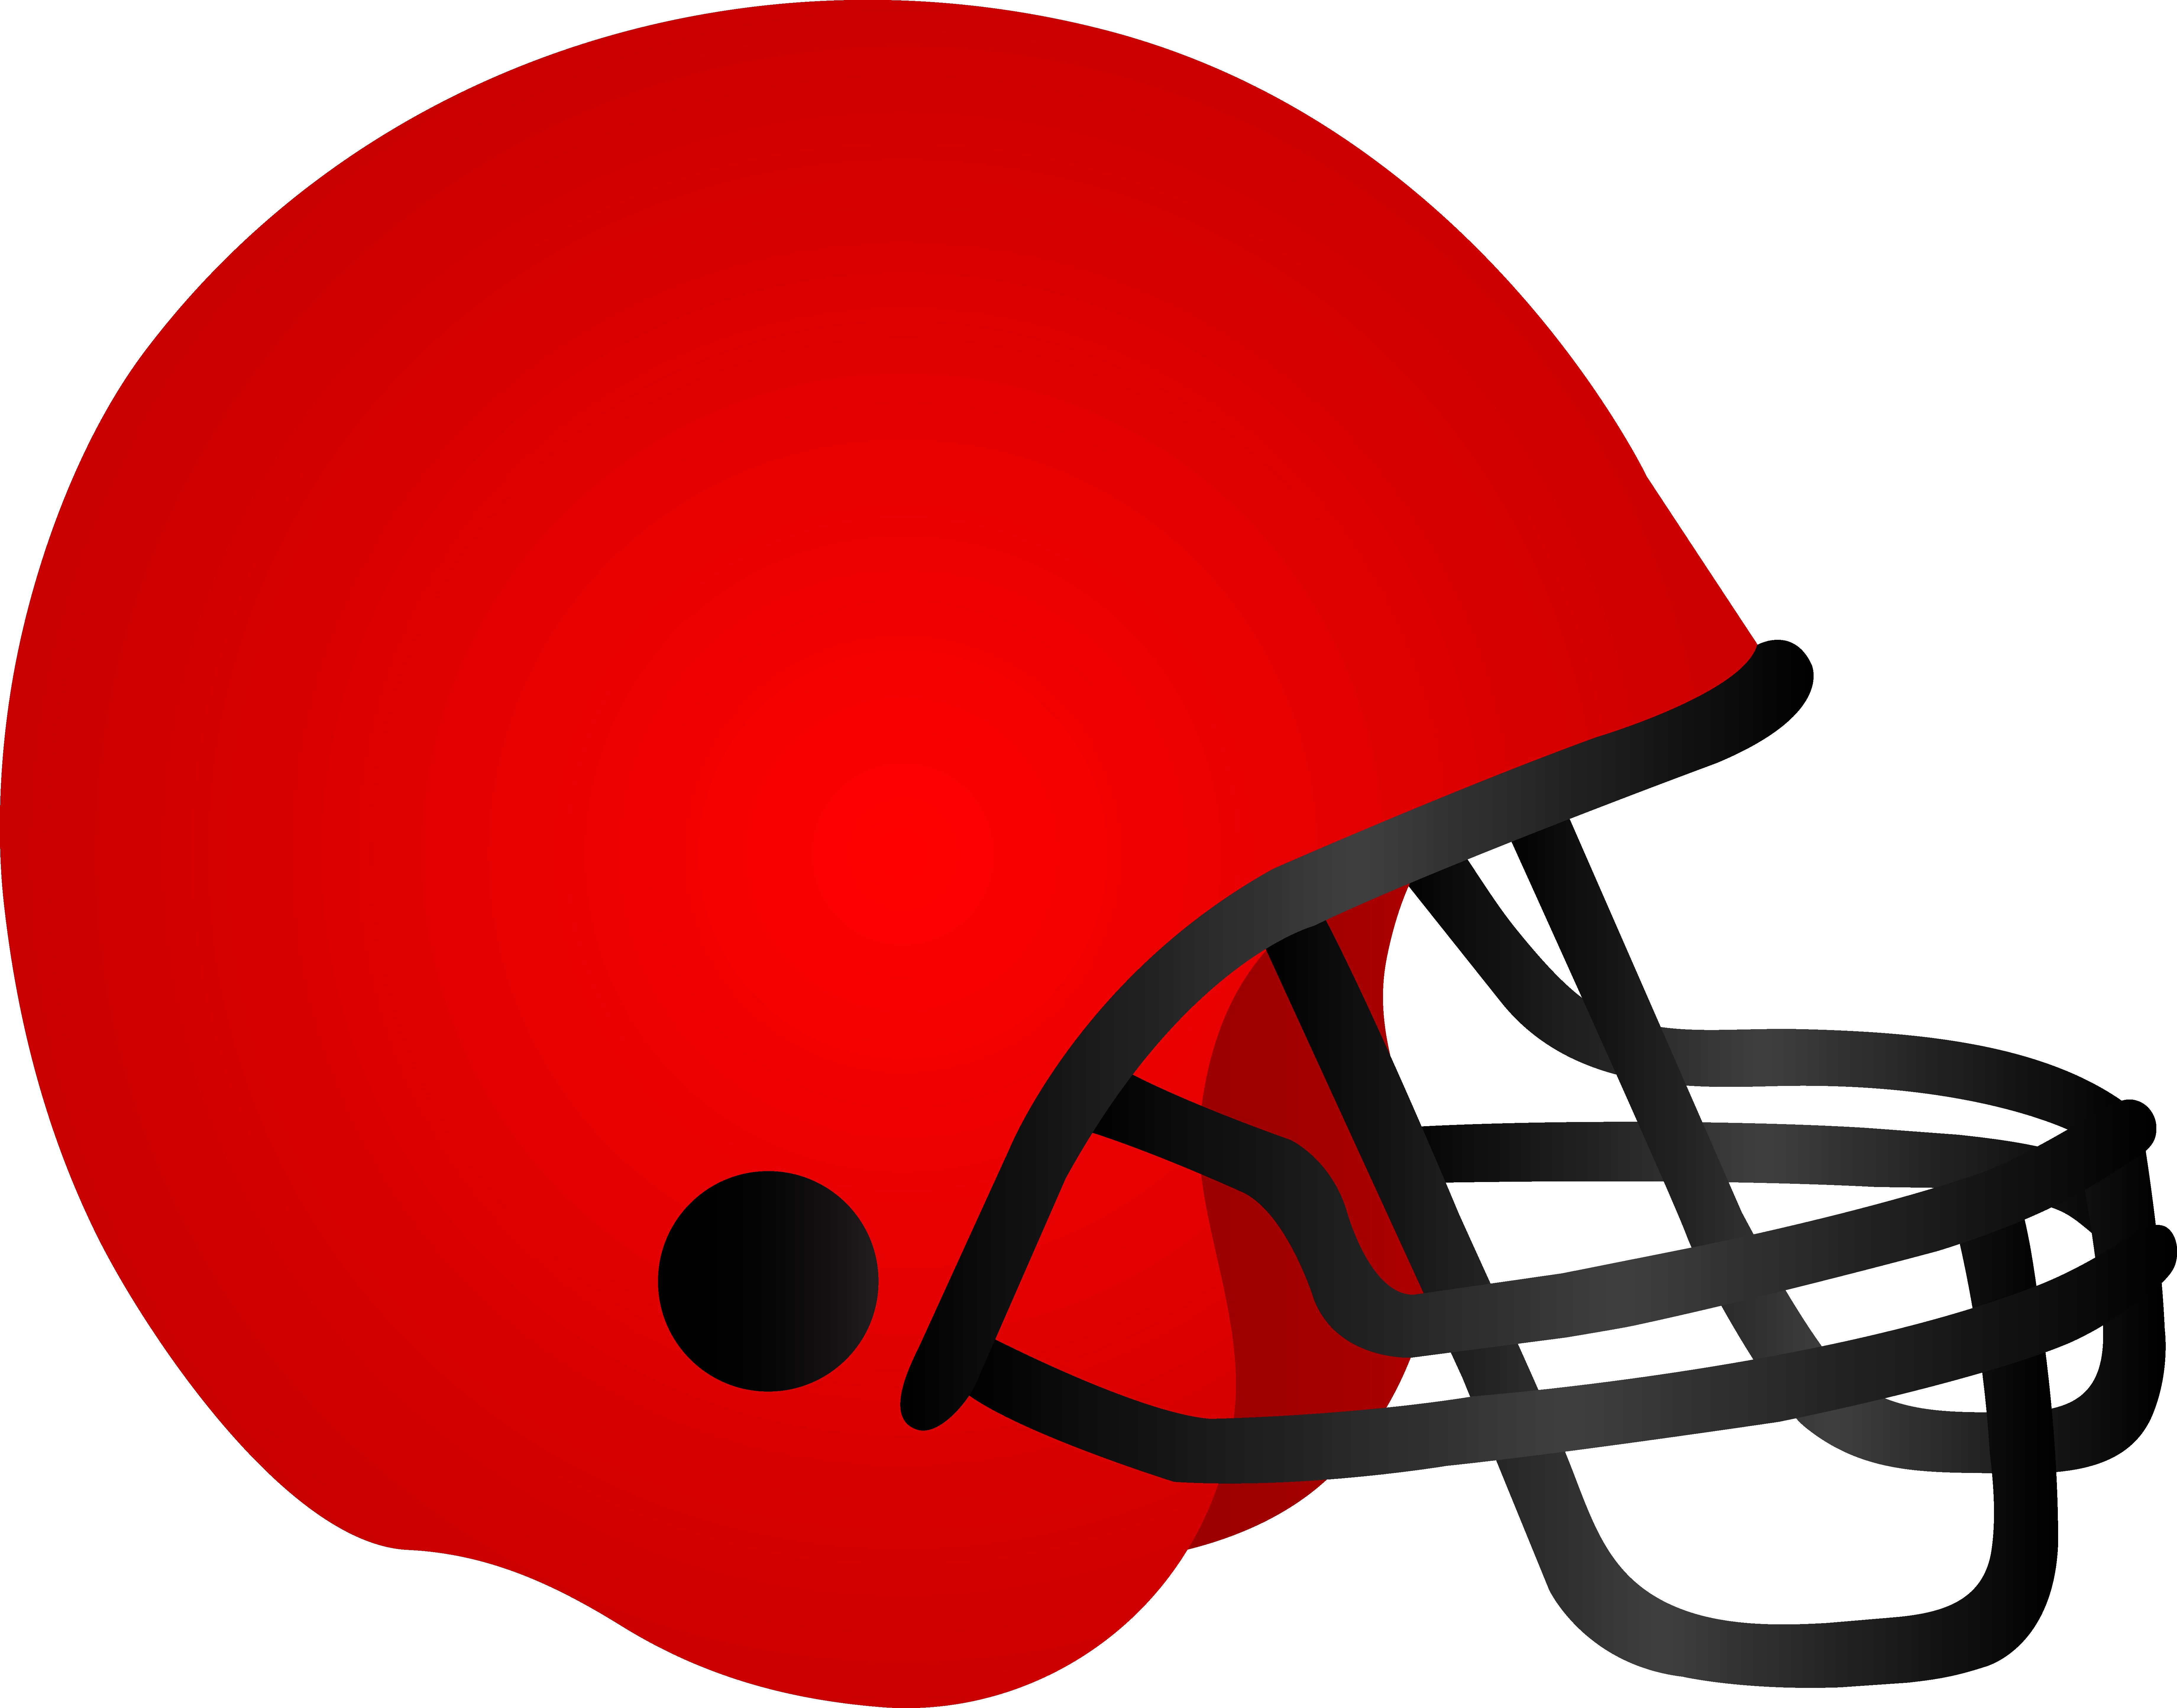 7362x5777 Red Football Helmets Clipart